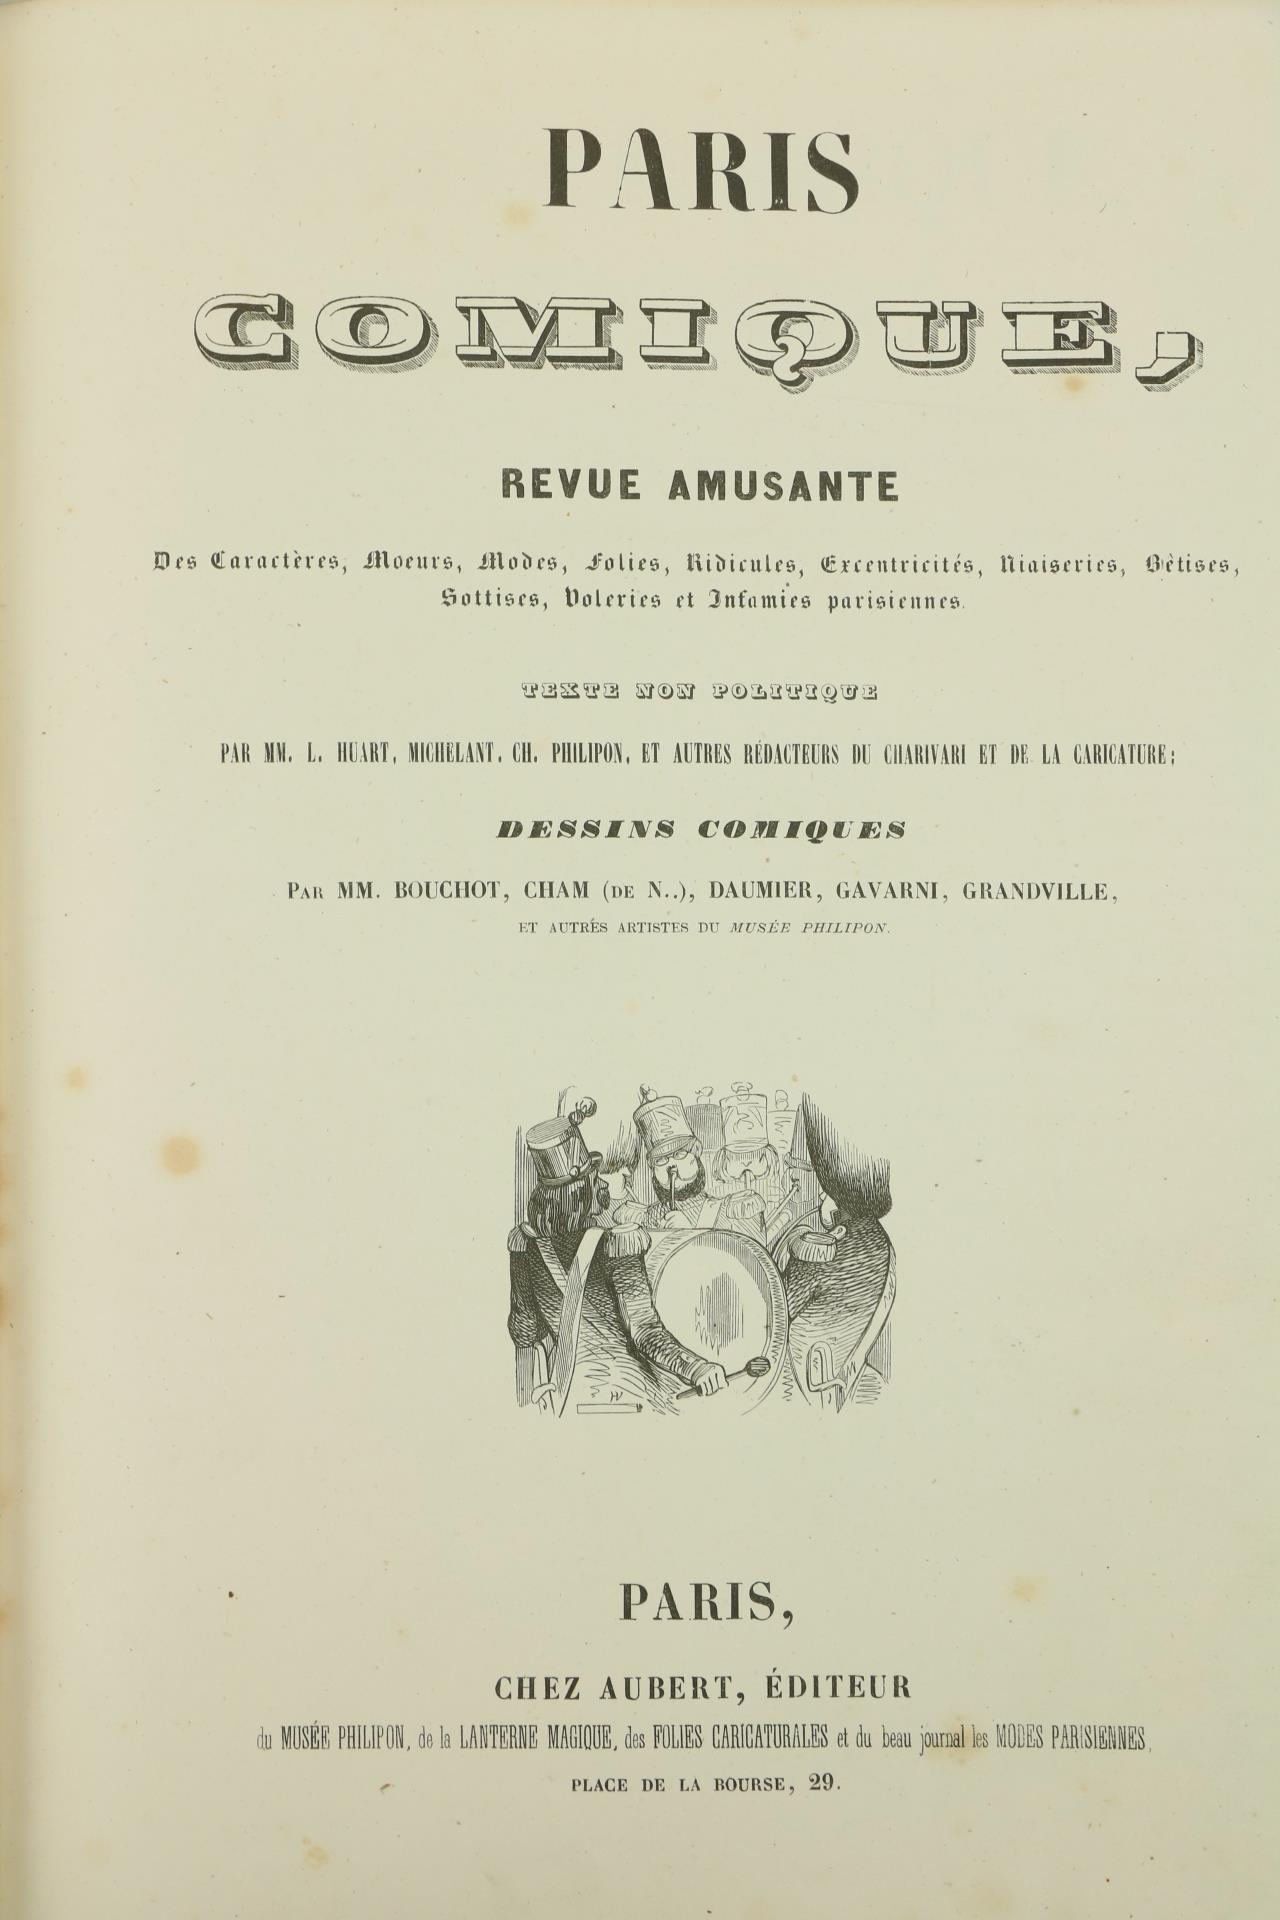 With Attractive Coloured Platesÿ Periodical:ÿÿParis Comique, Revue Amusante, lg. 4to Paris n.d. - Image 2 of 2